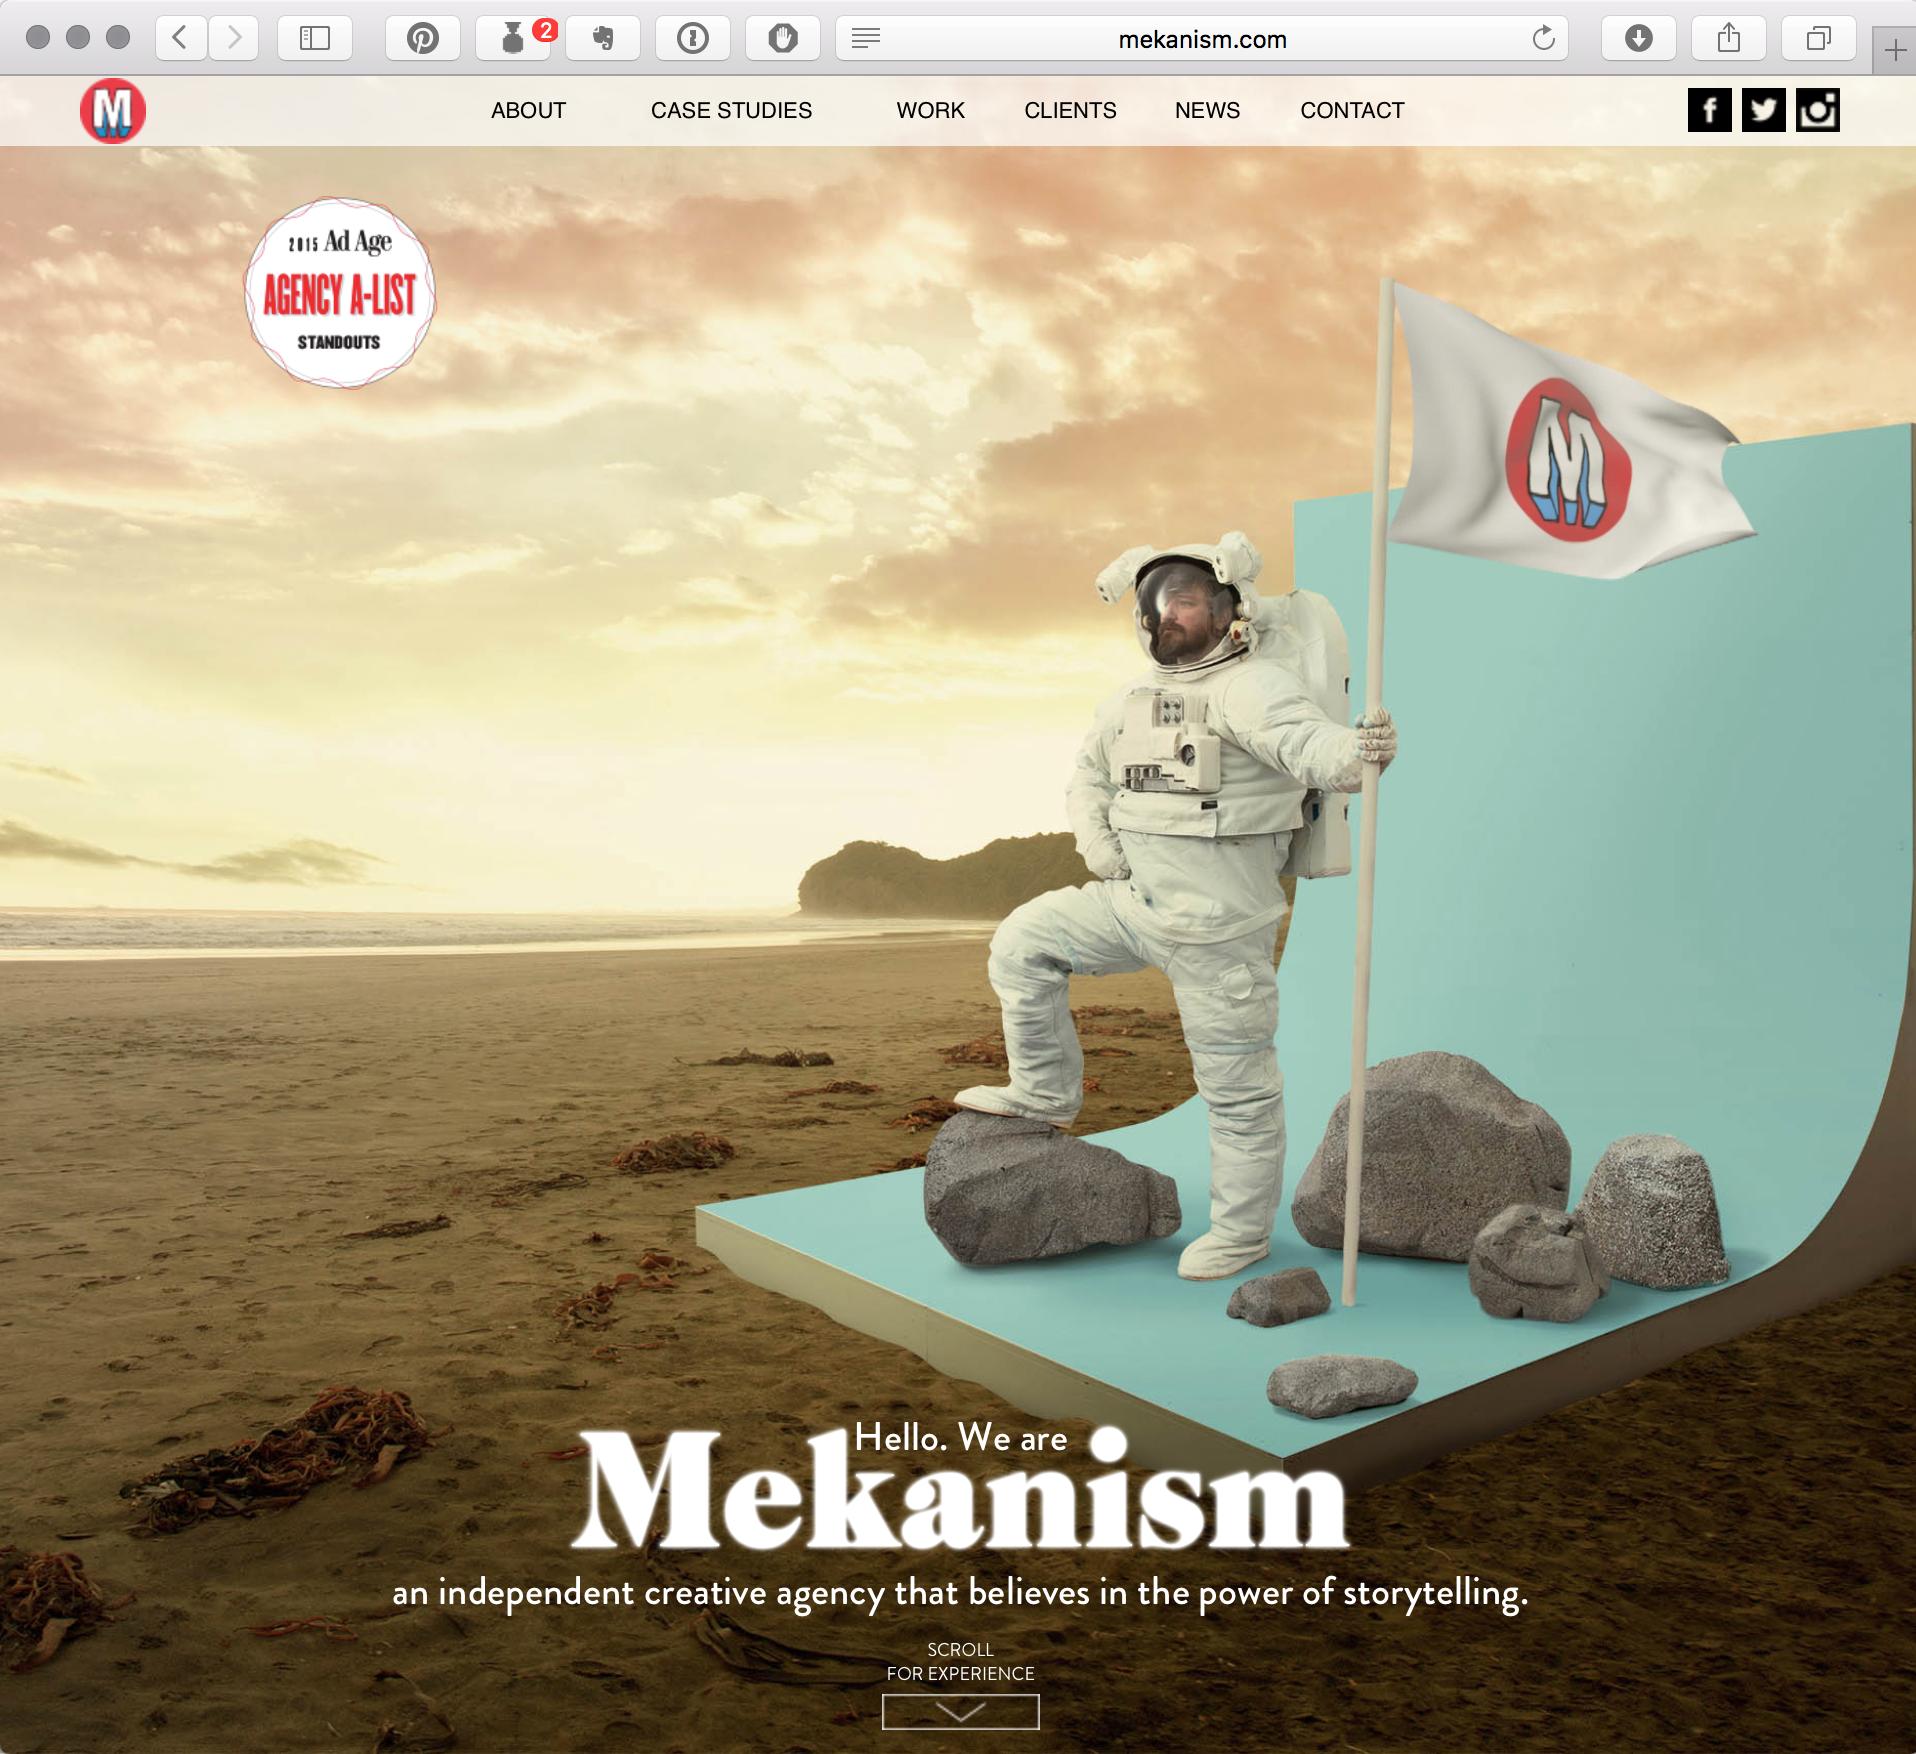 Mekanism: Parallax Site